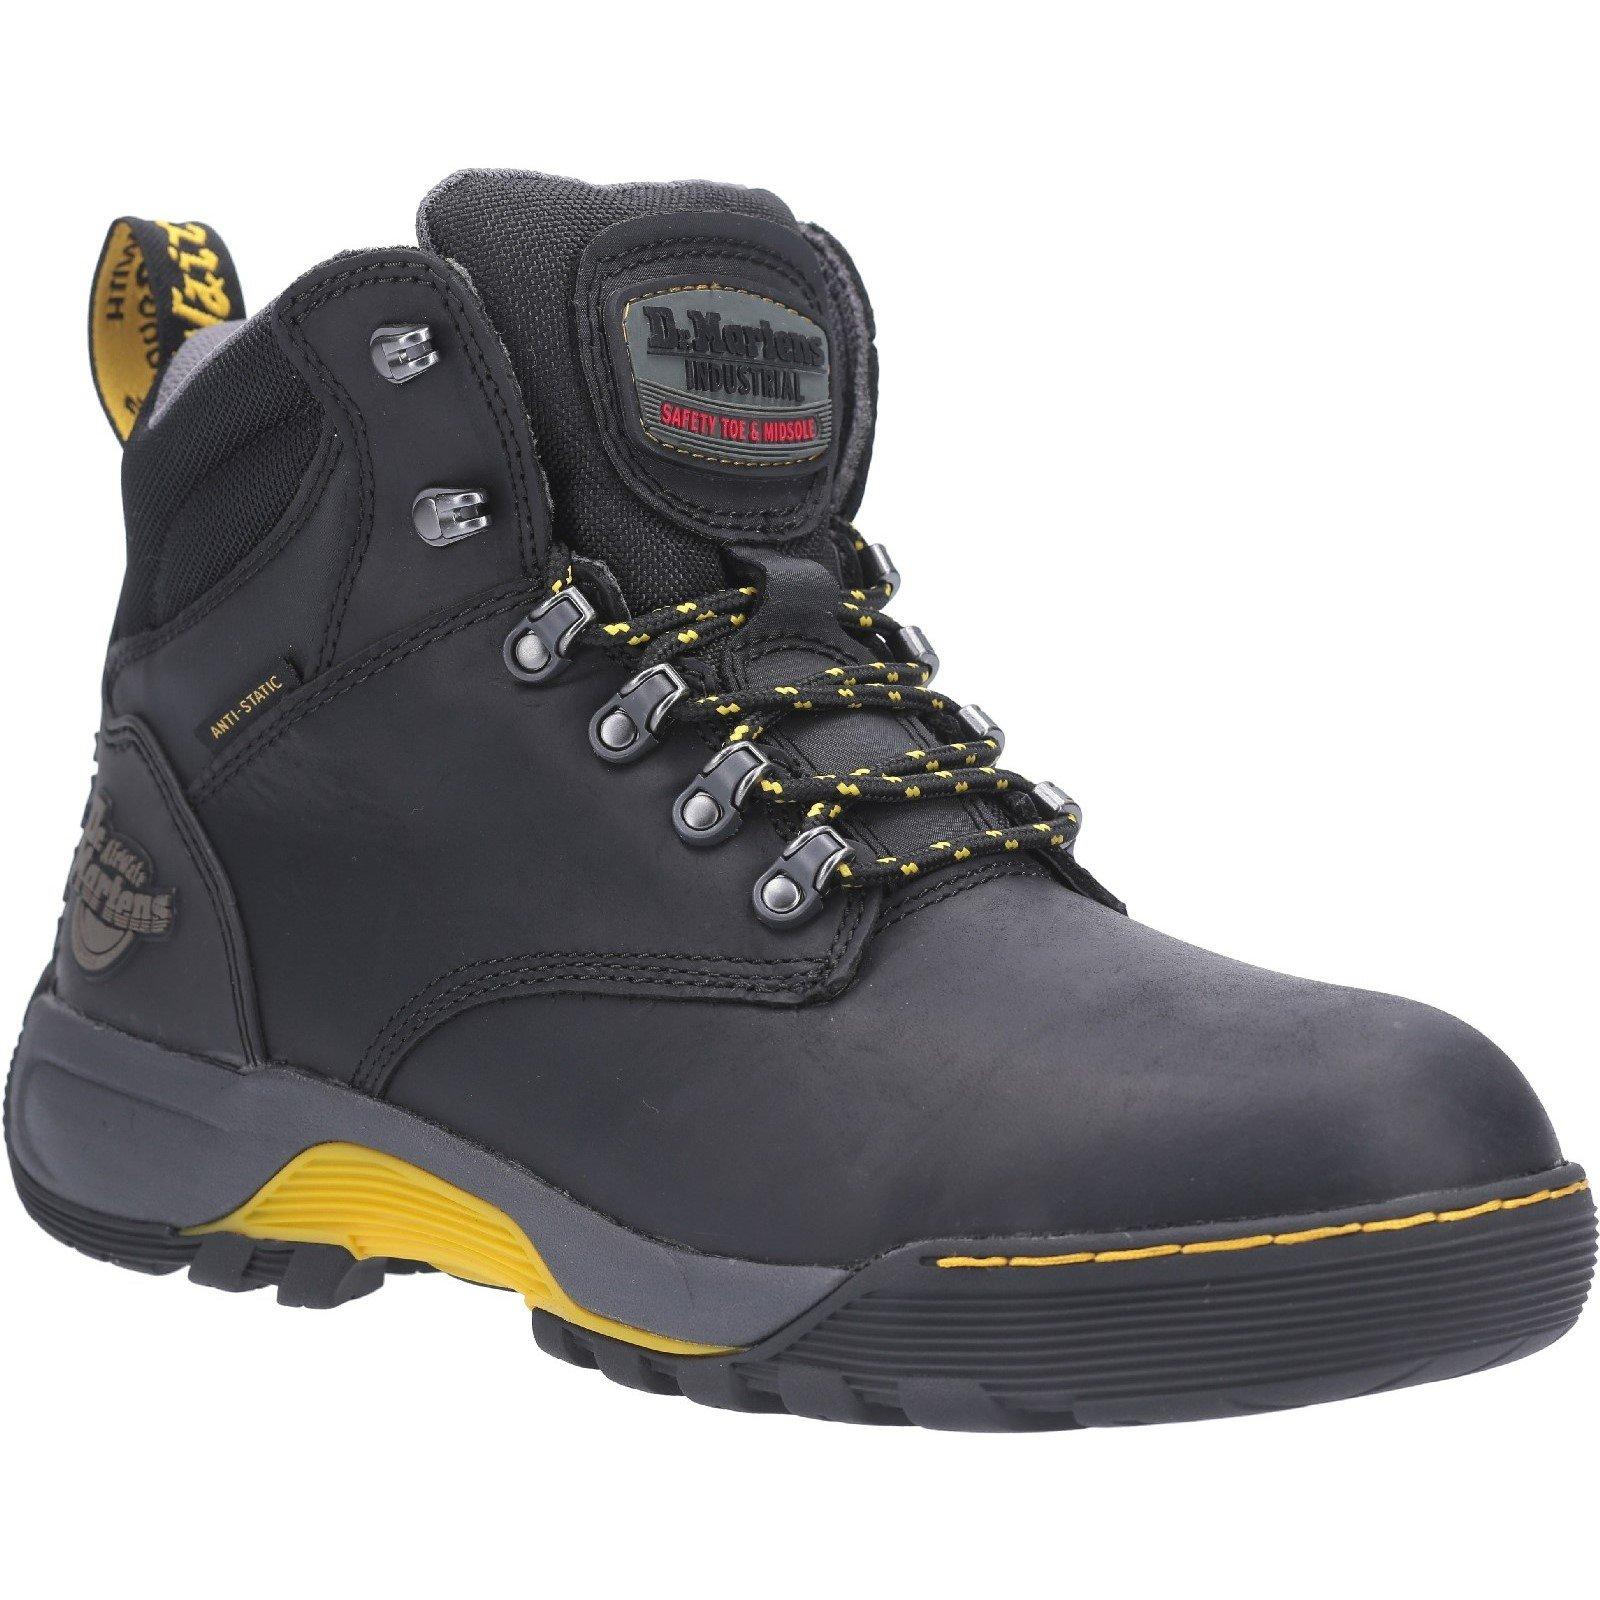 Dr Martens Unisex Ridge ST Lace Up Hiker Safety Boot Black 28324 - Black 5